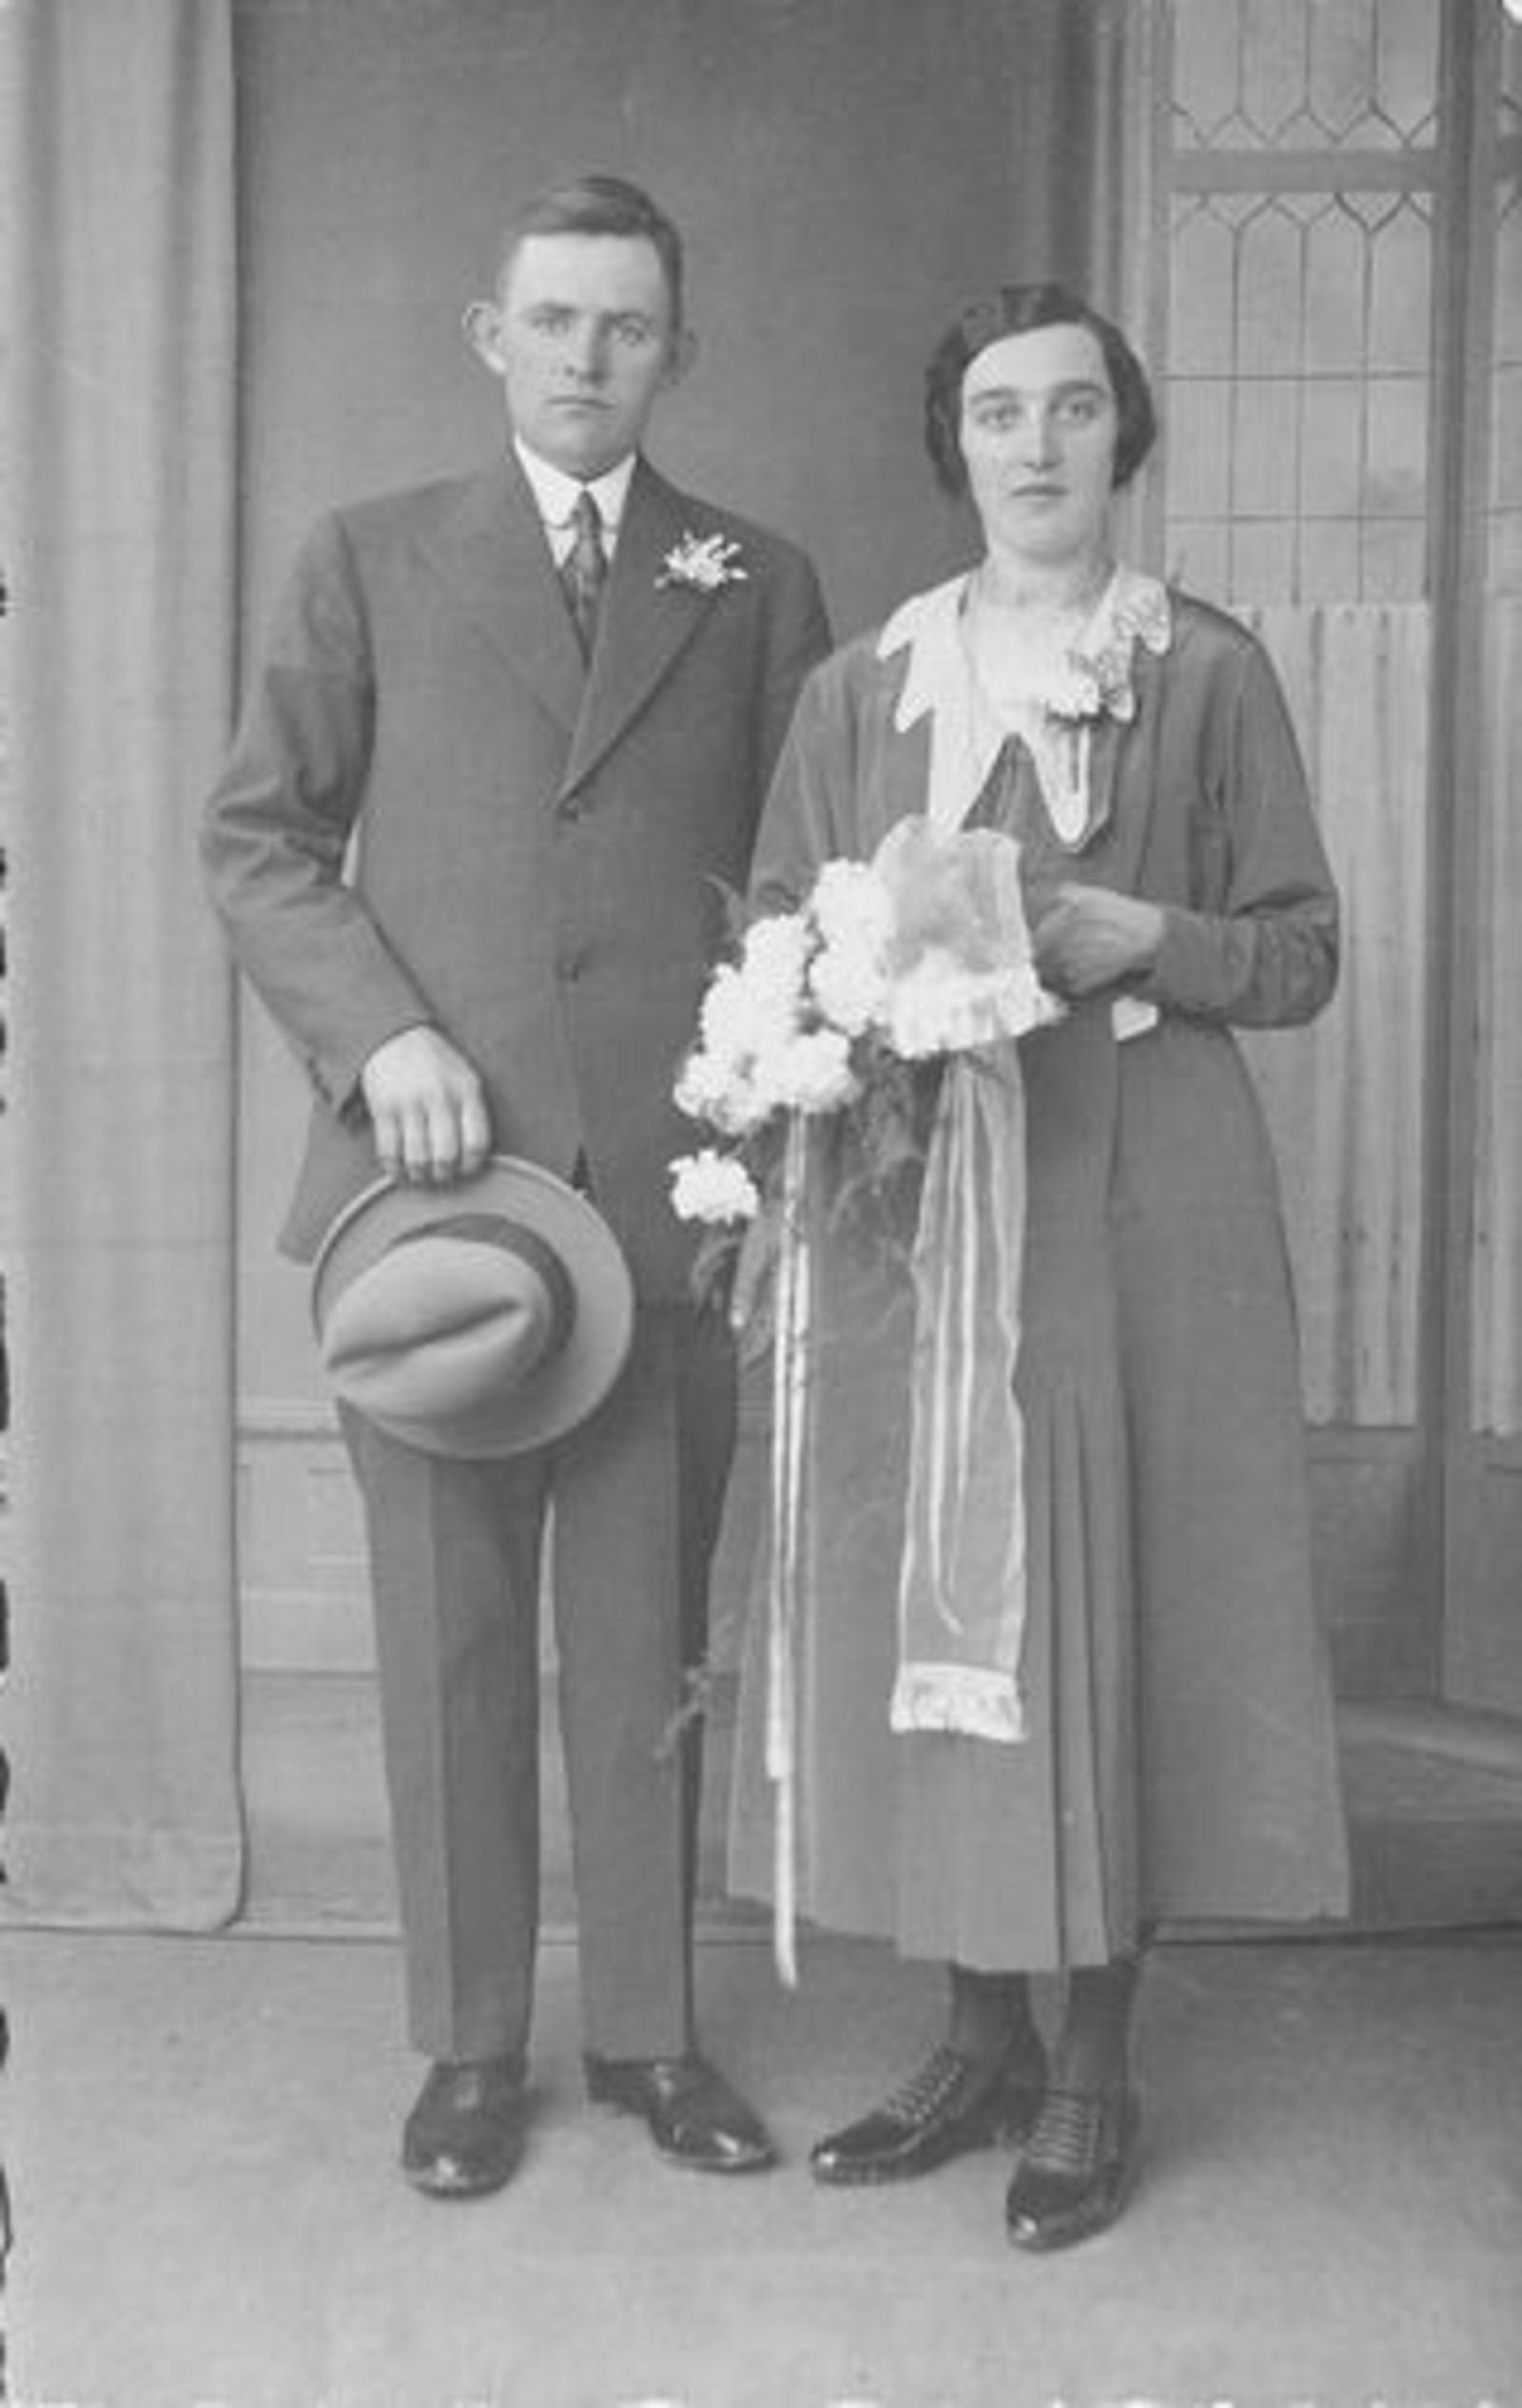 Hulst Adrianus A 19__ trouwt Johanna G Koeckhoven 00